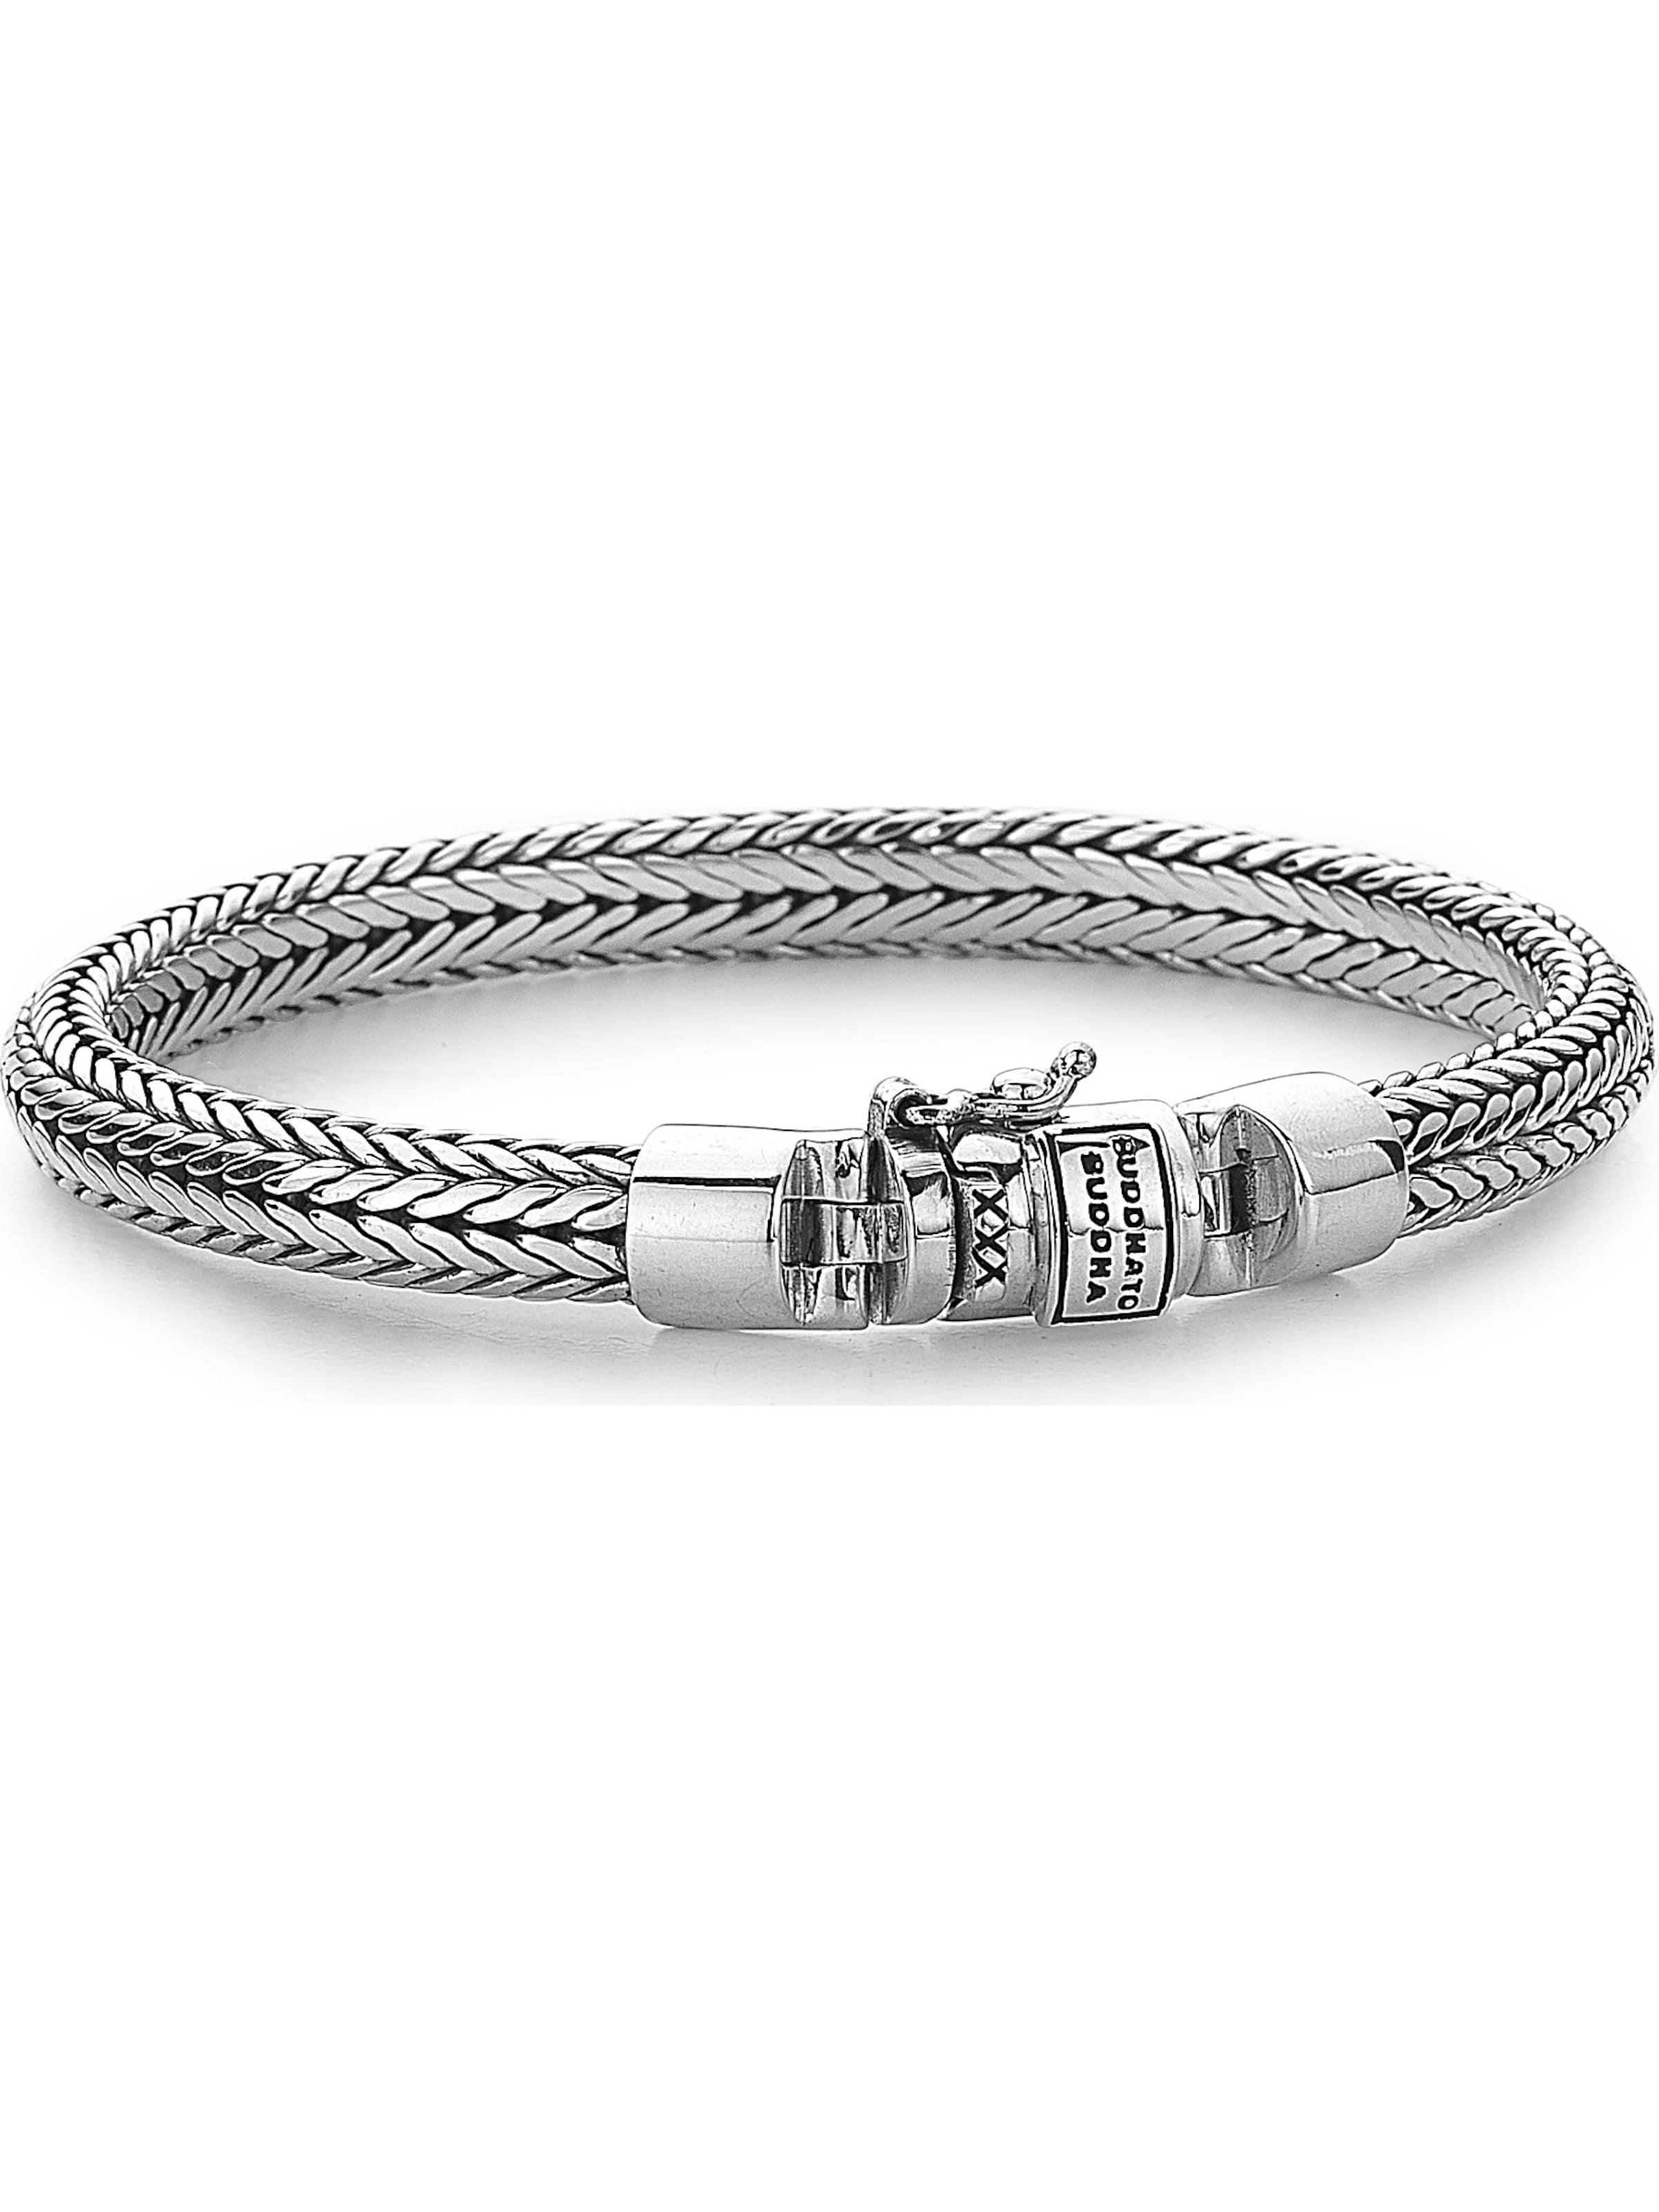 Buddha Armband In In To Buddha Buddha Armband Armband To Silber Silber To fgy7b6